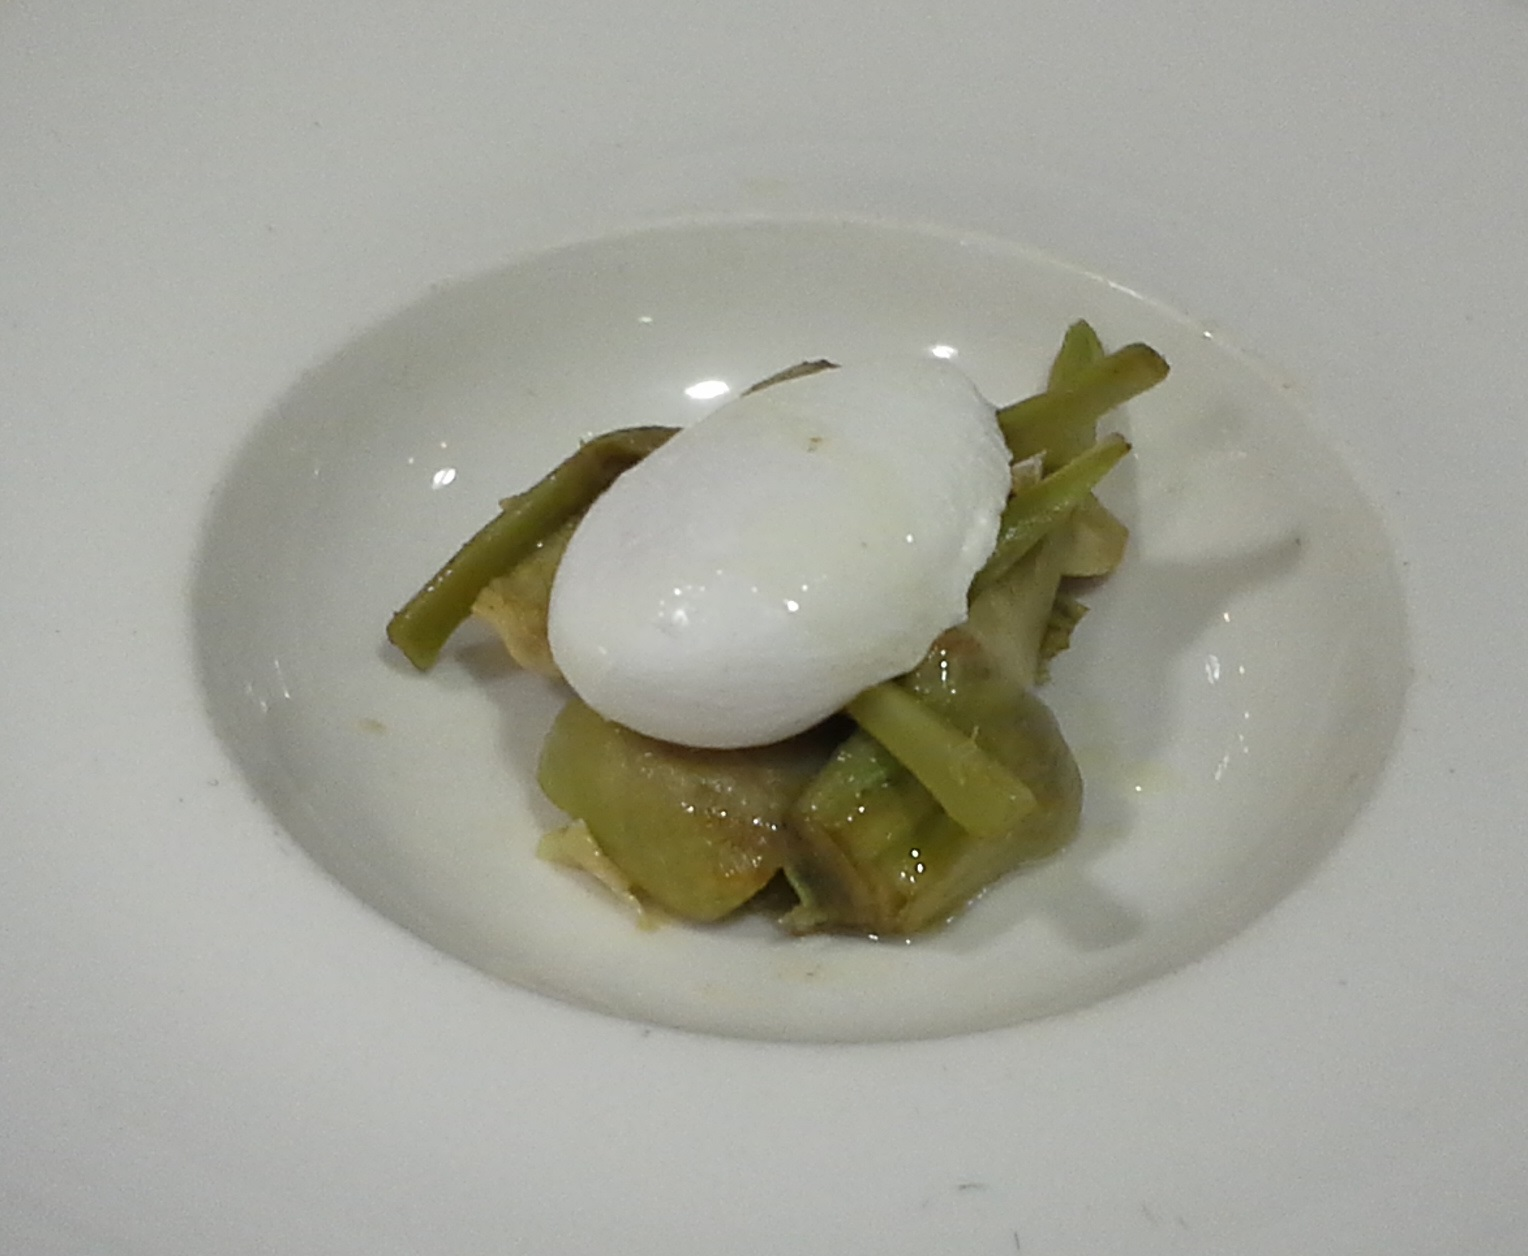 alcachofa trufa huevo poche hofmann elcoladorchino